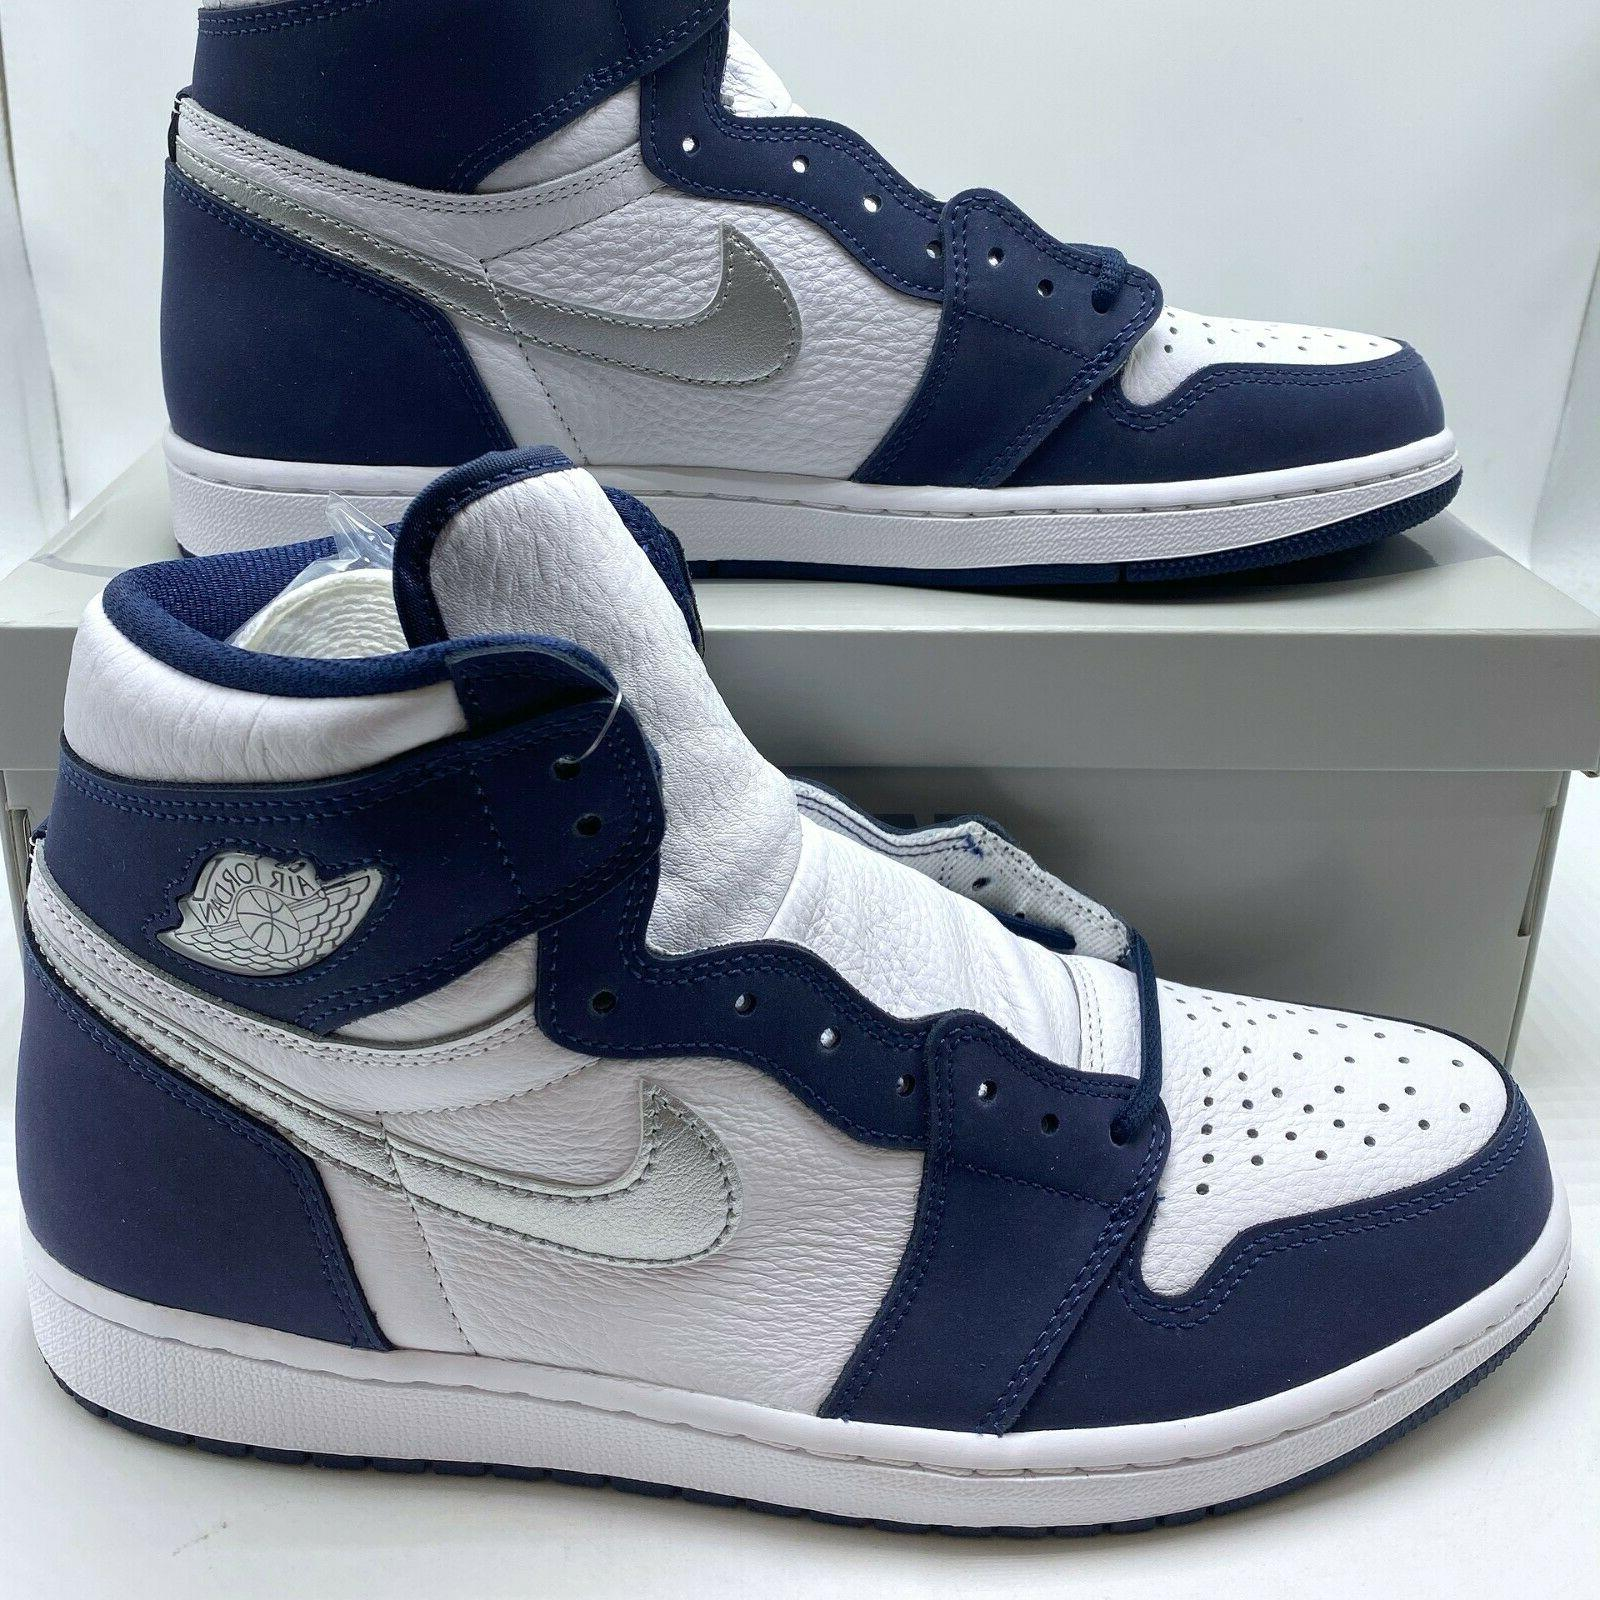 Air Jordan High CO Men's Shoes Navy DC1788-100 8-14